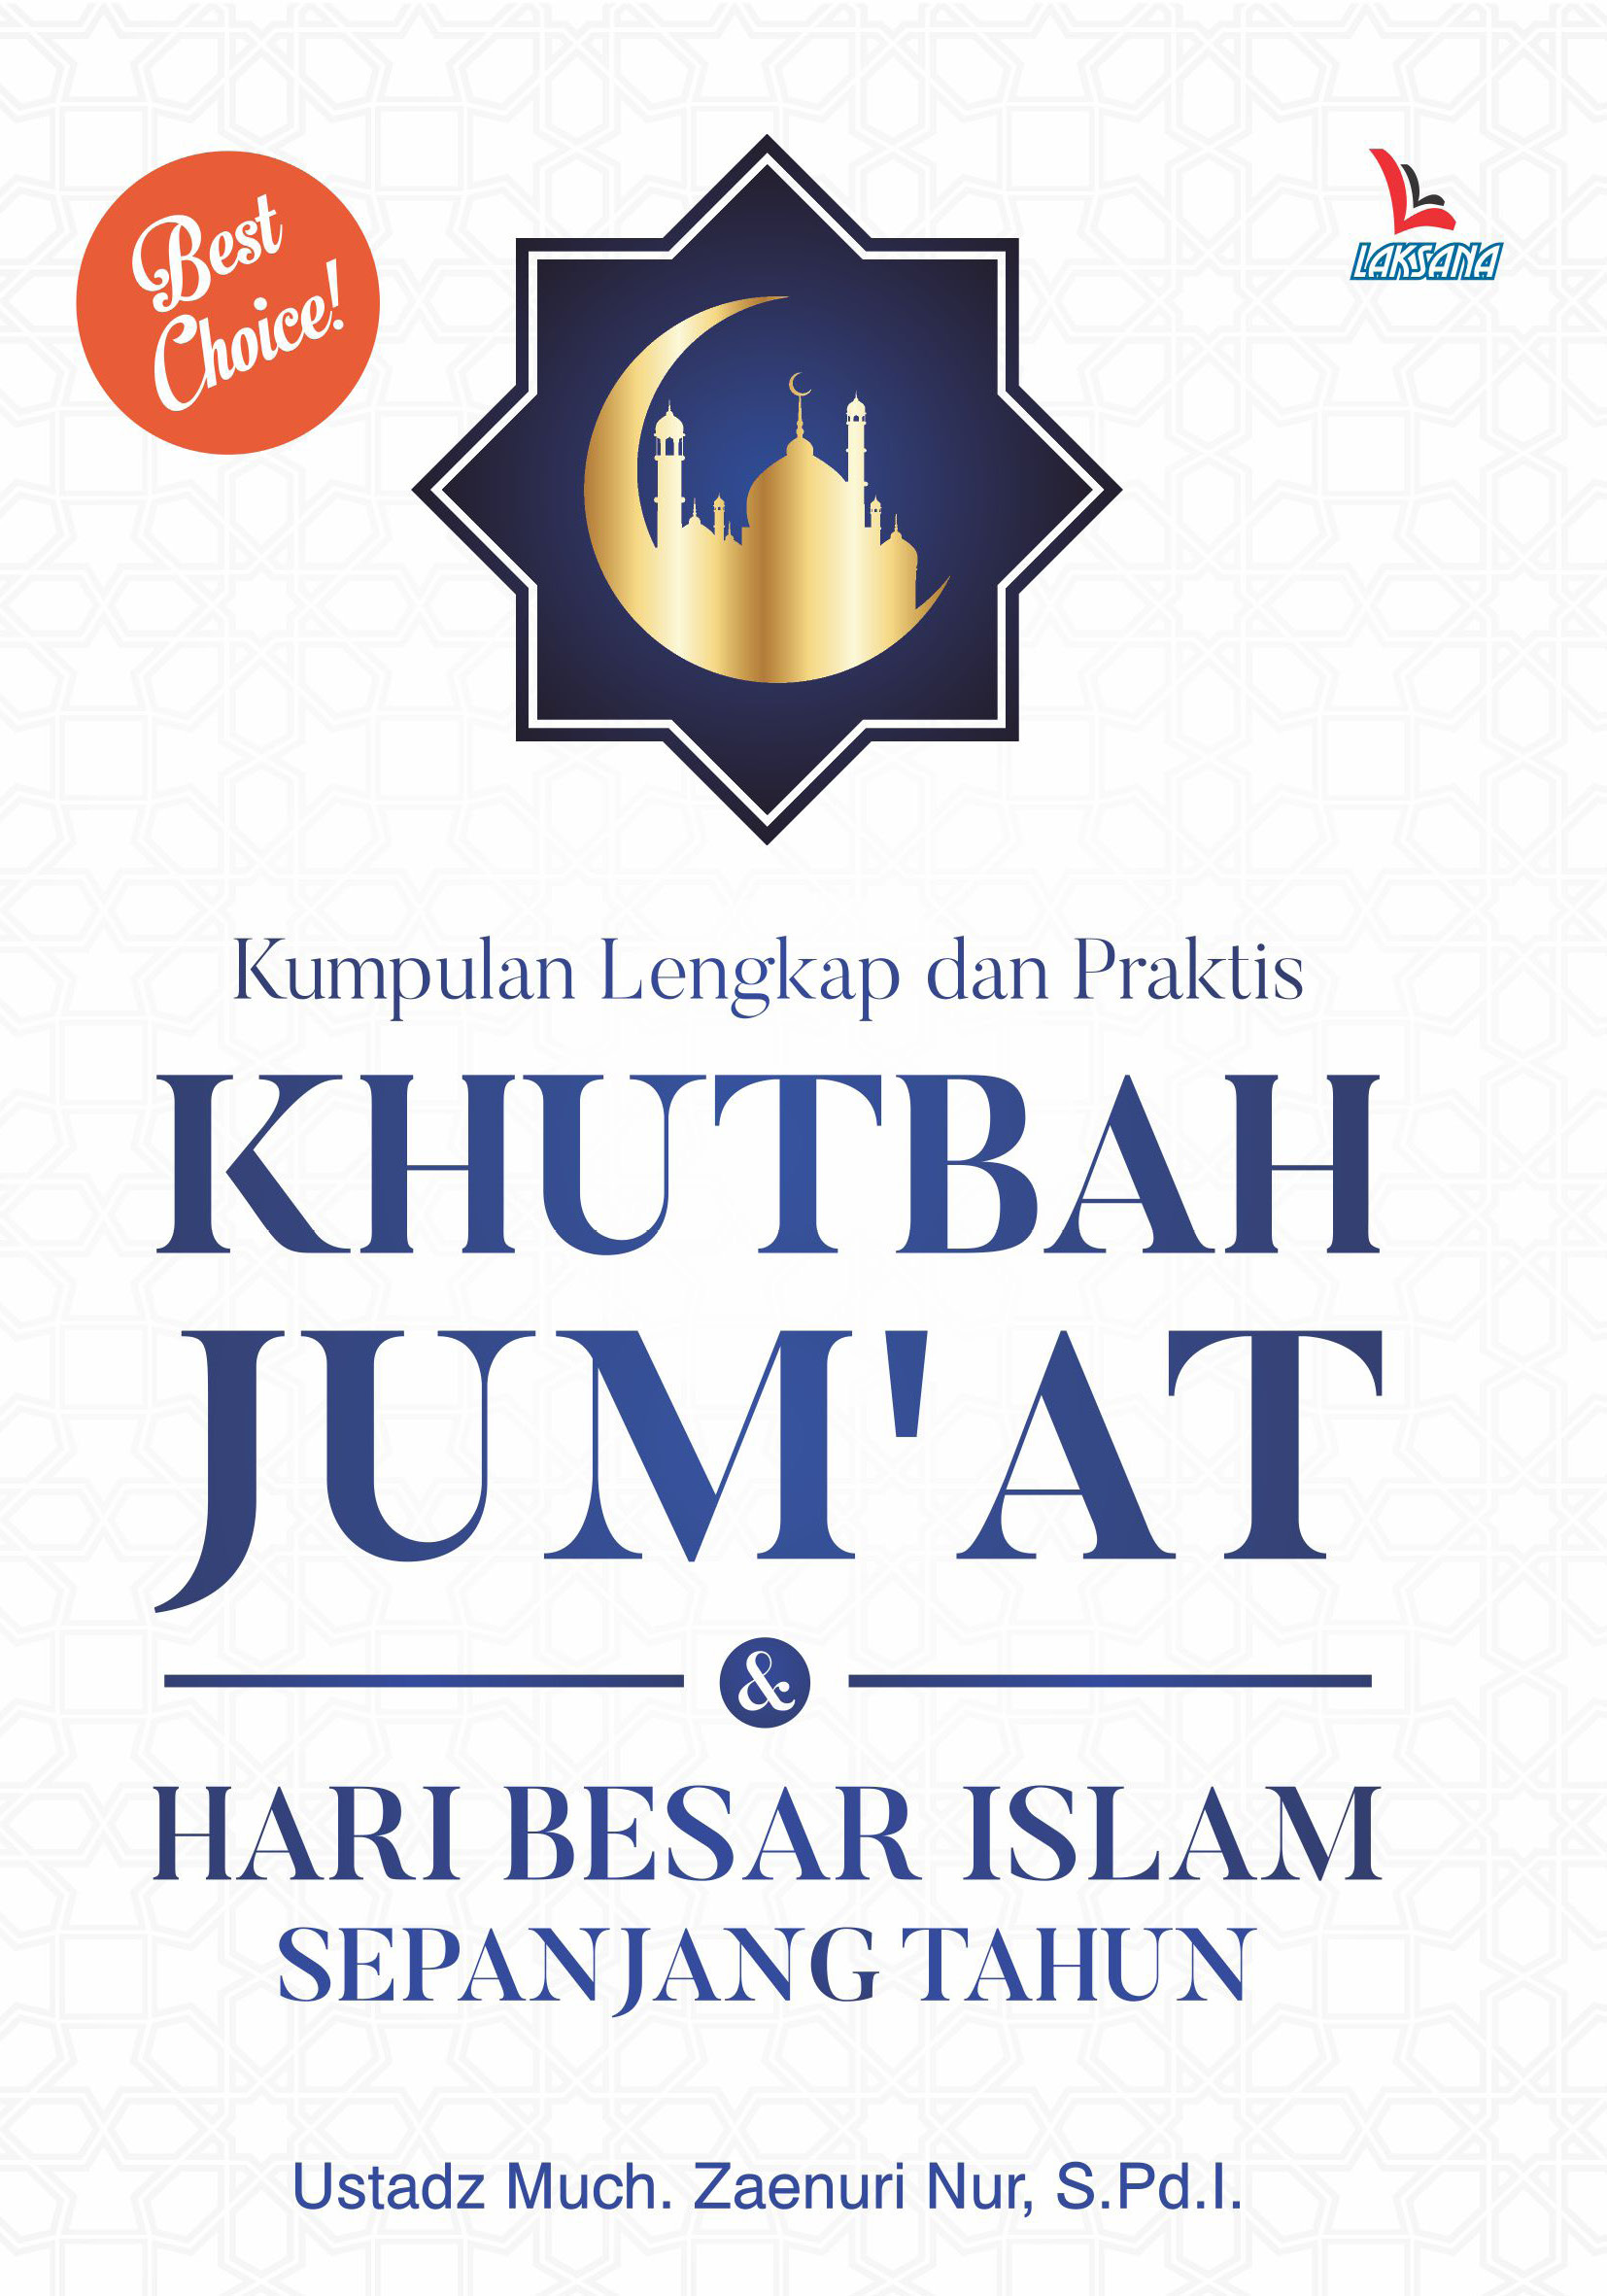 Kumpulan lengkap dan praktis khutbah jum'at hari besar islam sepanjang tahun [sumber elektronis]